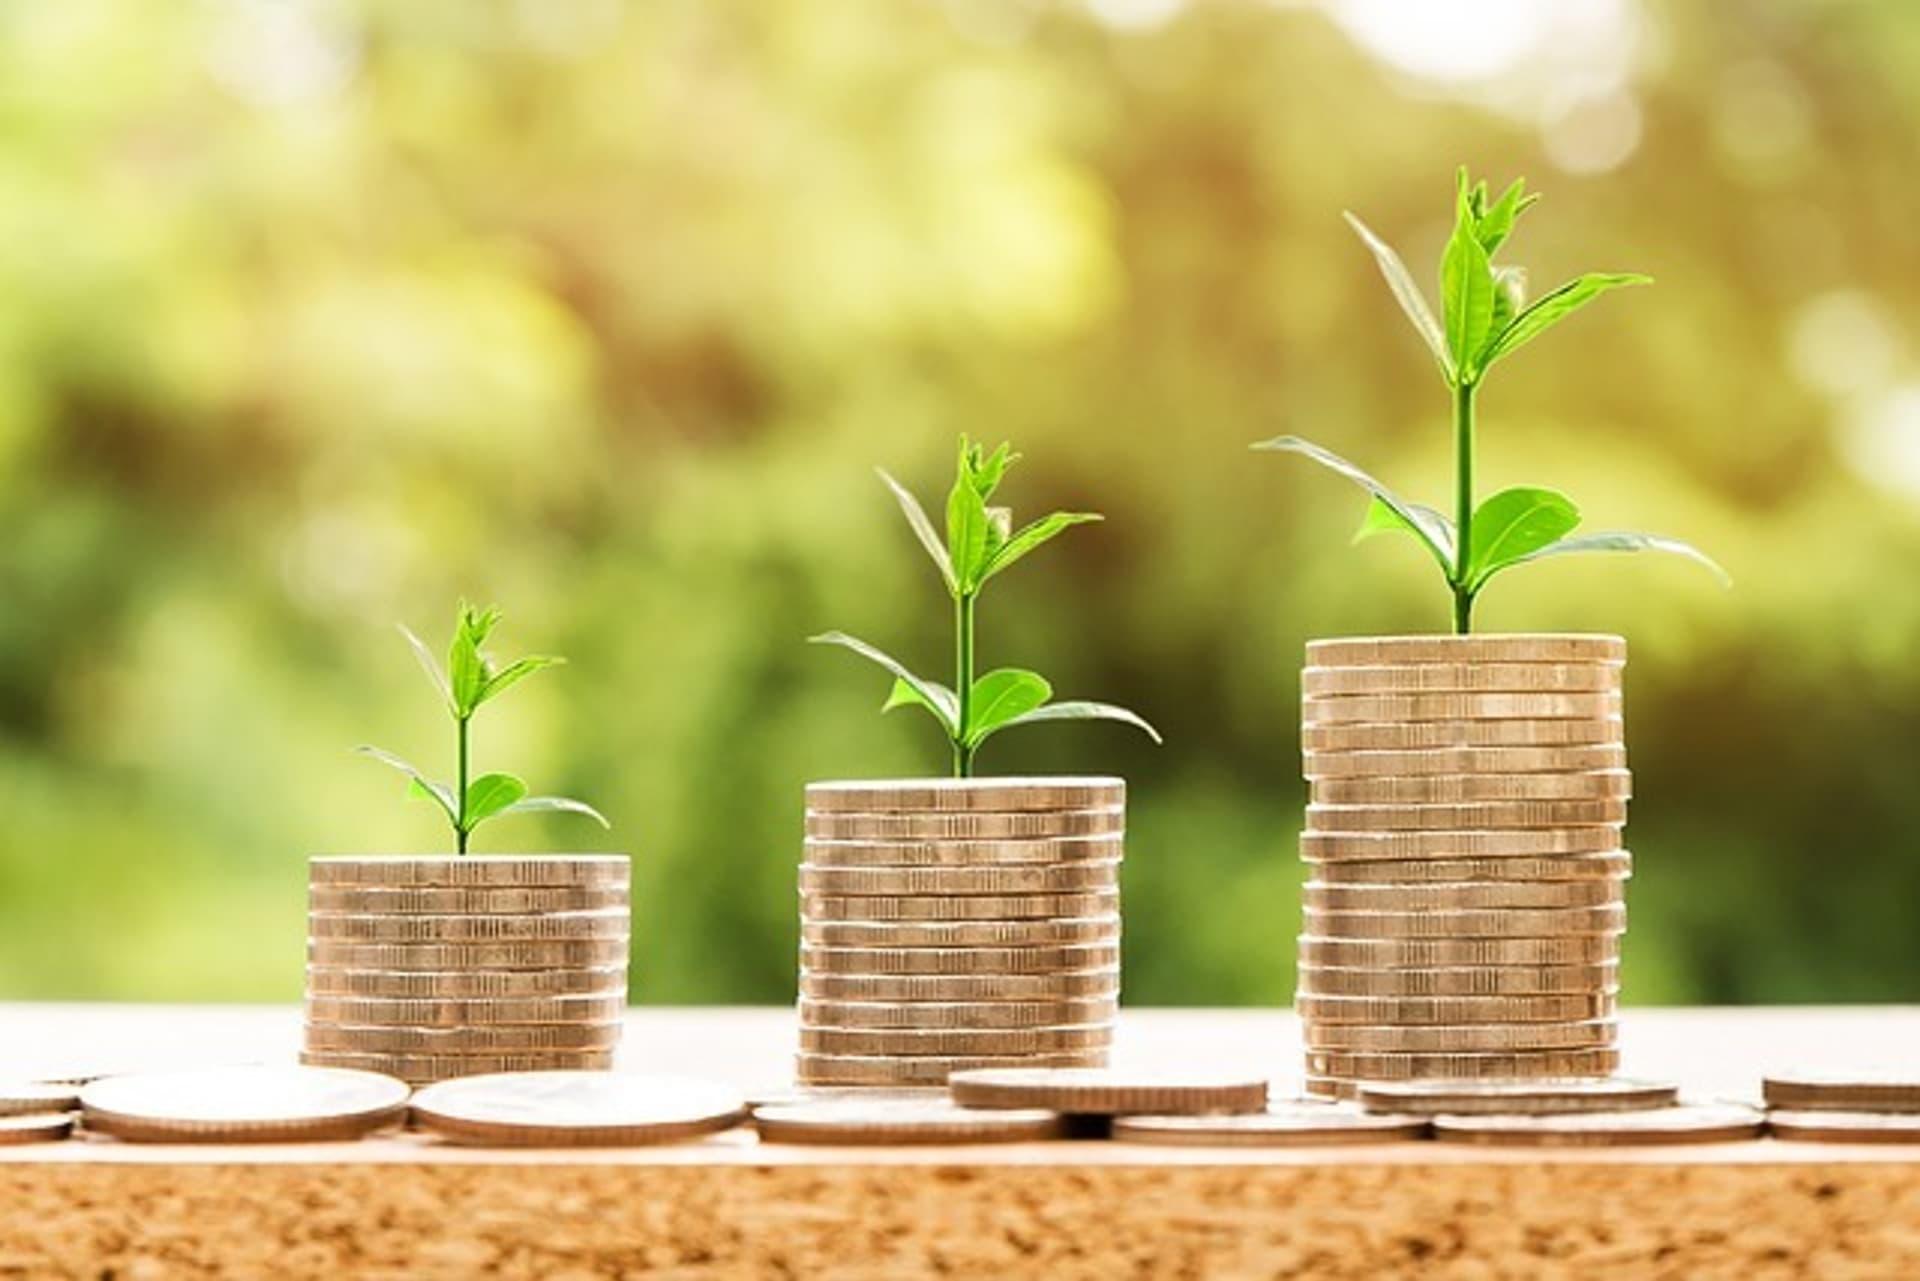 Money 2696219 640 nattanan23 Pixabay